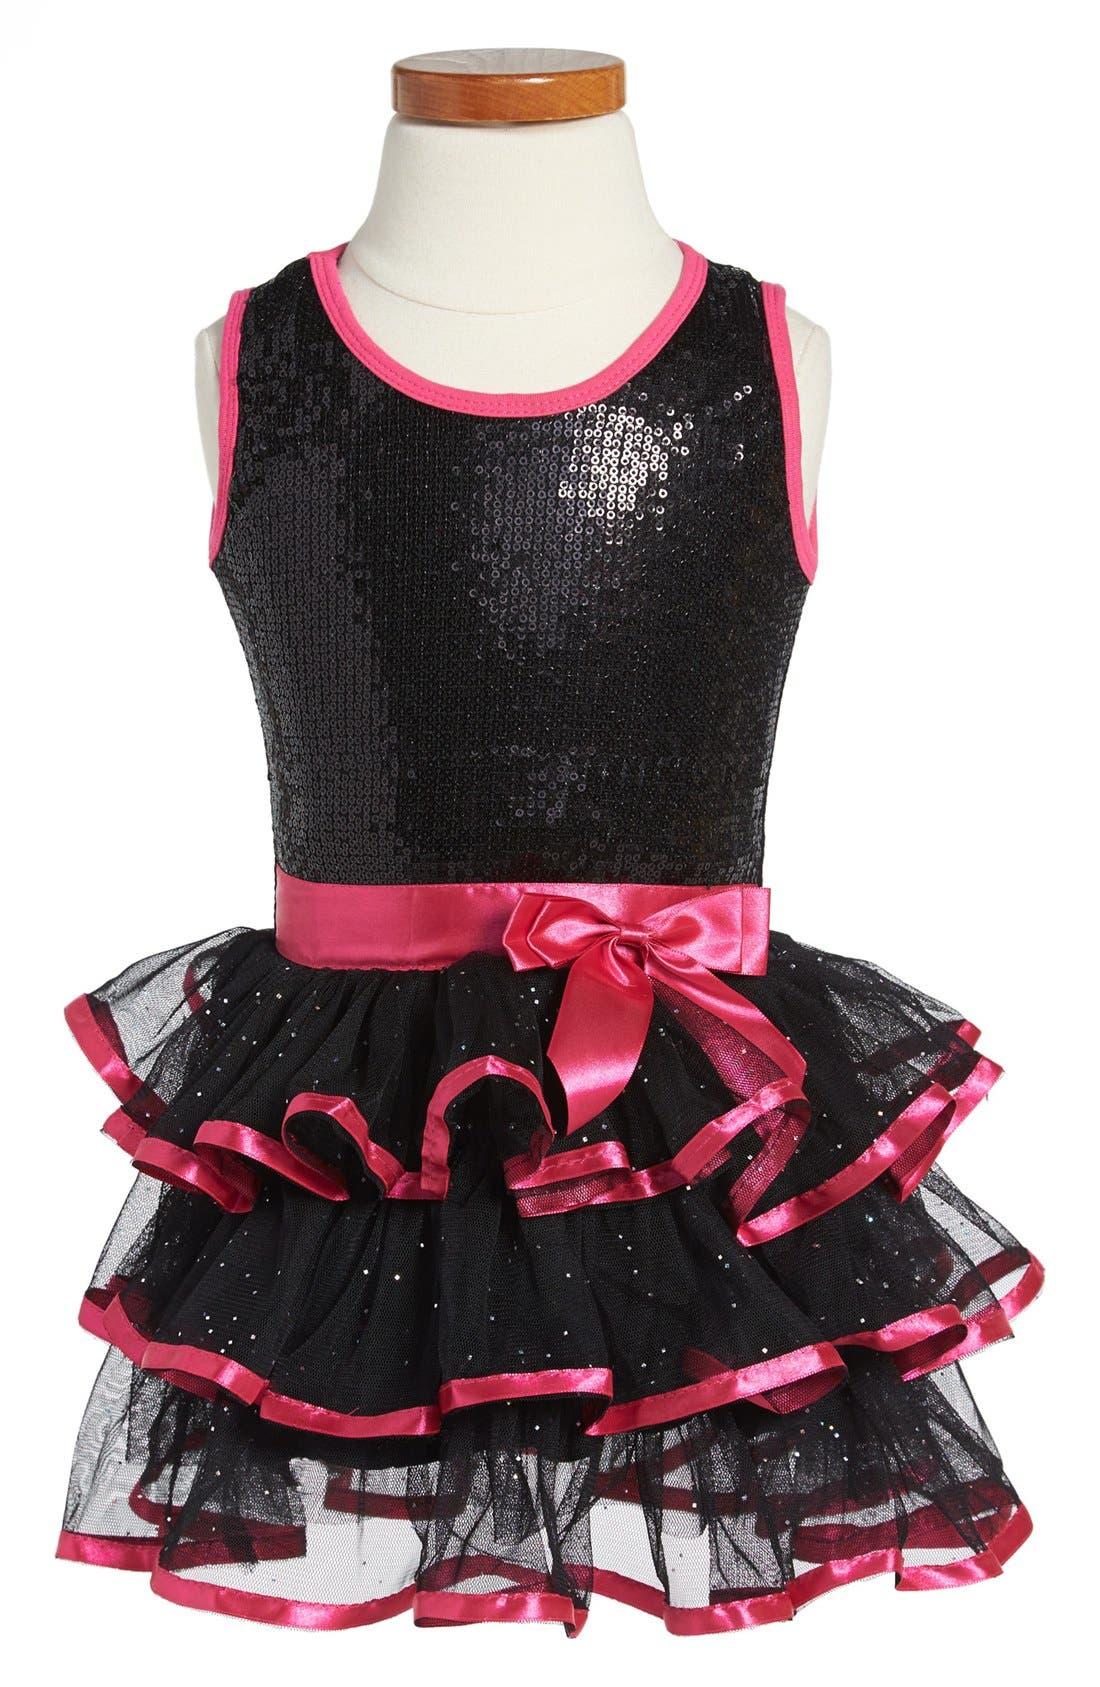 Main Image - Popatu Sequin Tiered Skirt Dress (Toddler Girls)